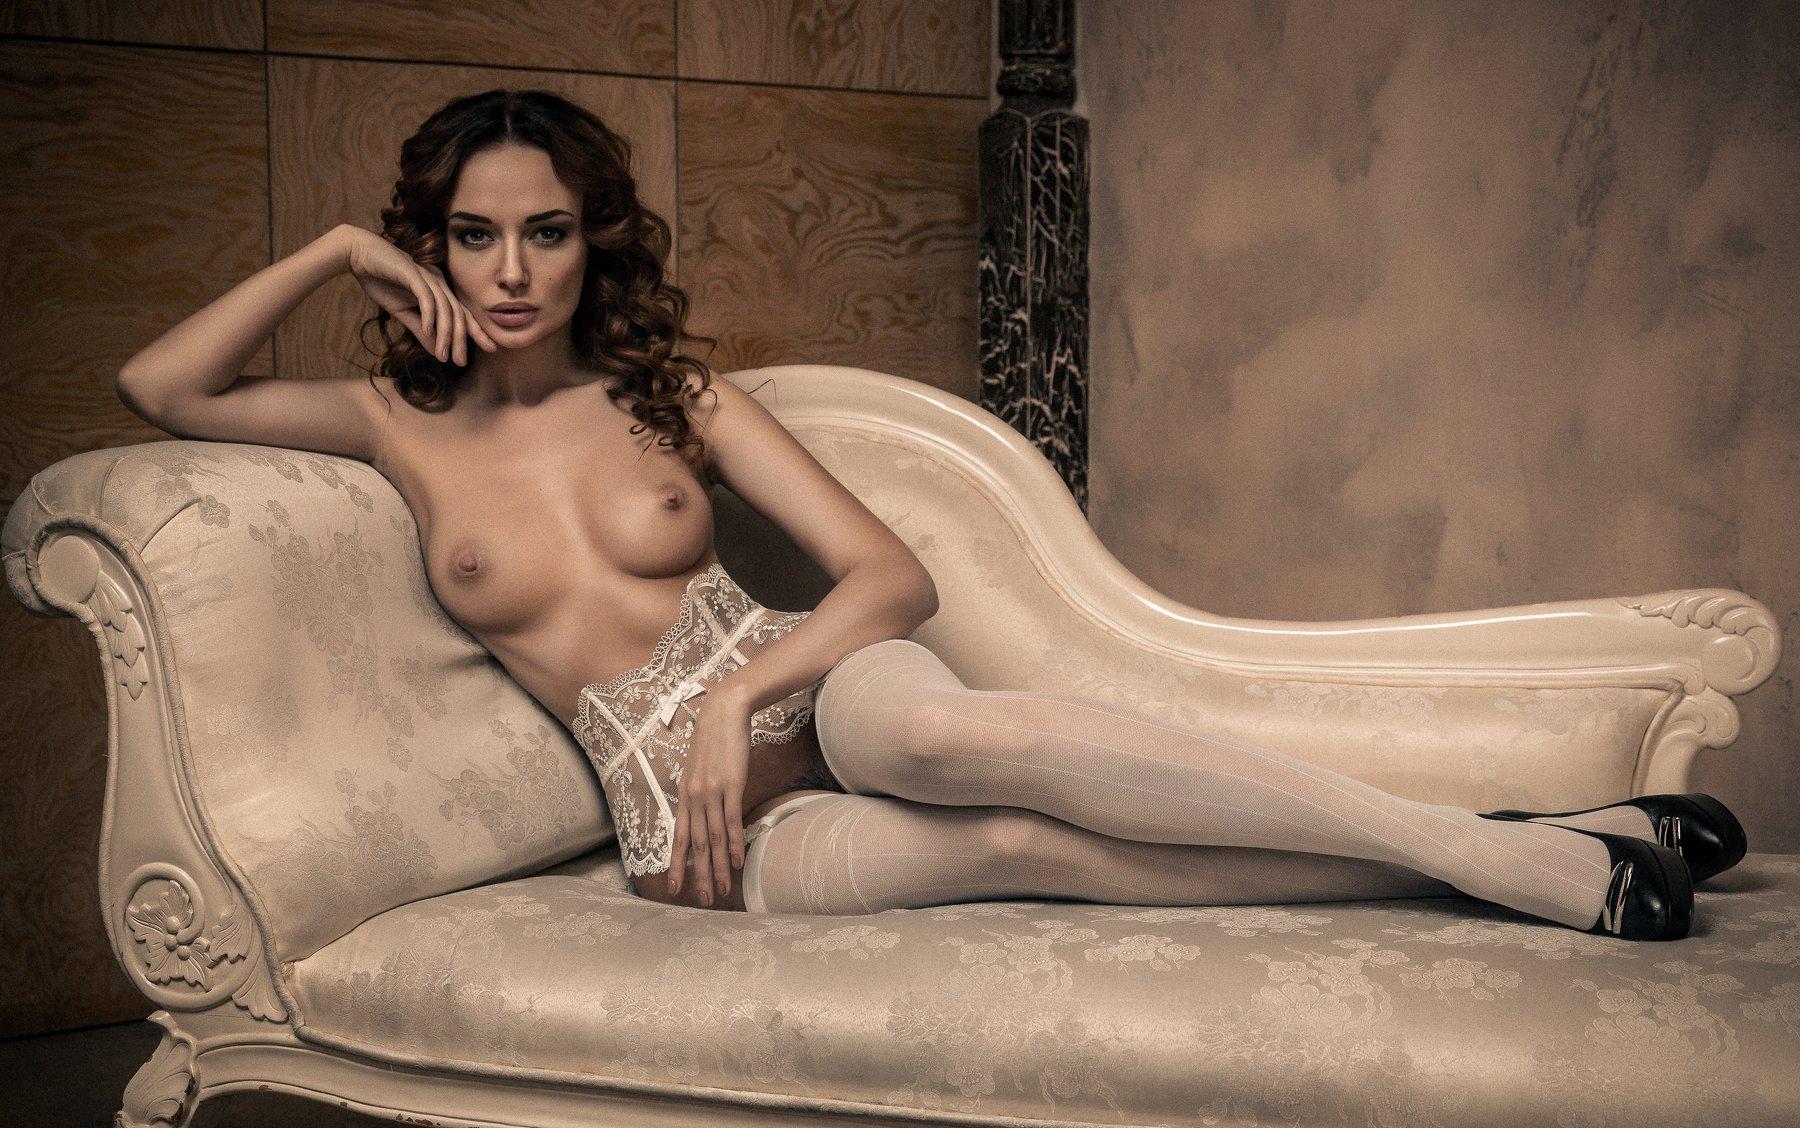 Half cup bra ecrin glamour nude glamorous lise charmel